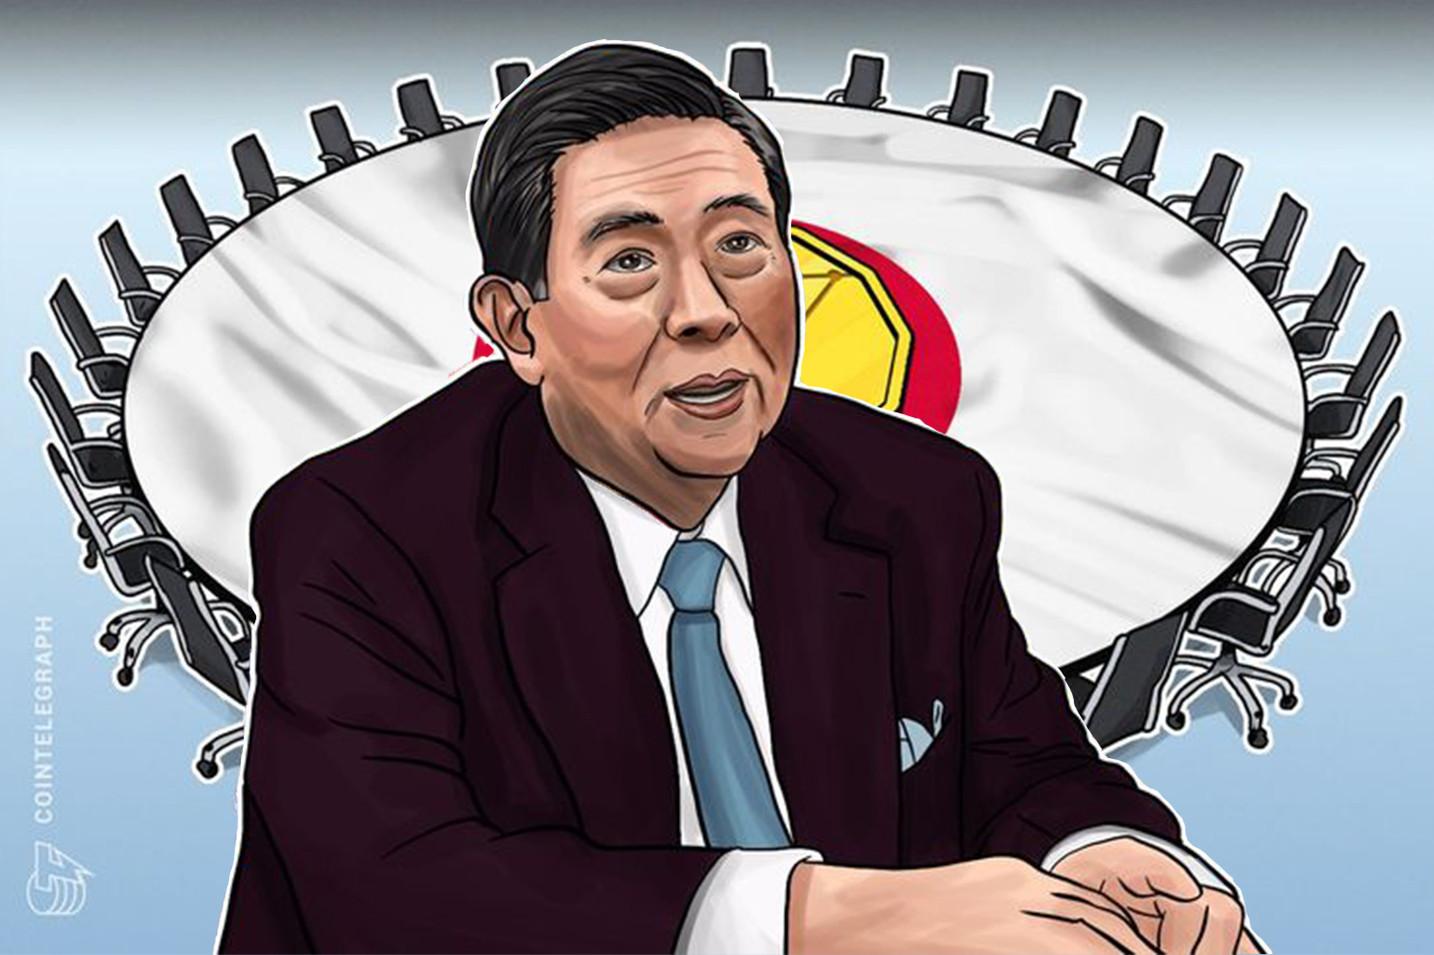 SBI北尾氏、日本仮想通貨交換業協会(JVCEA)を痛烈に批判